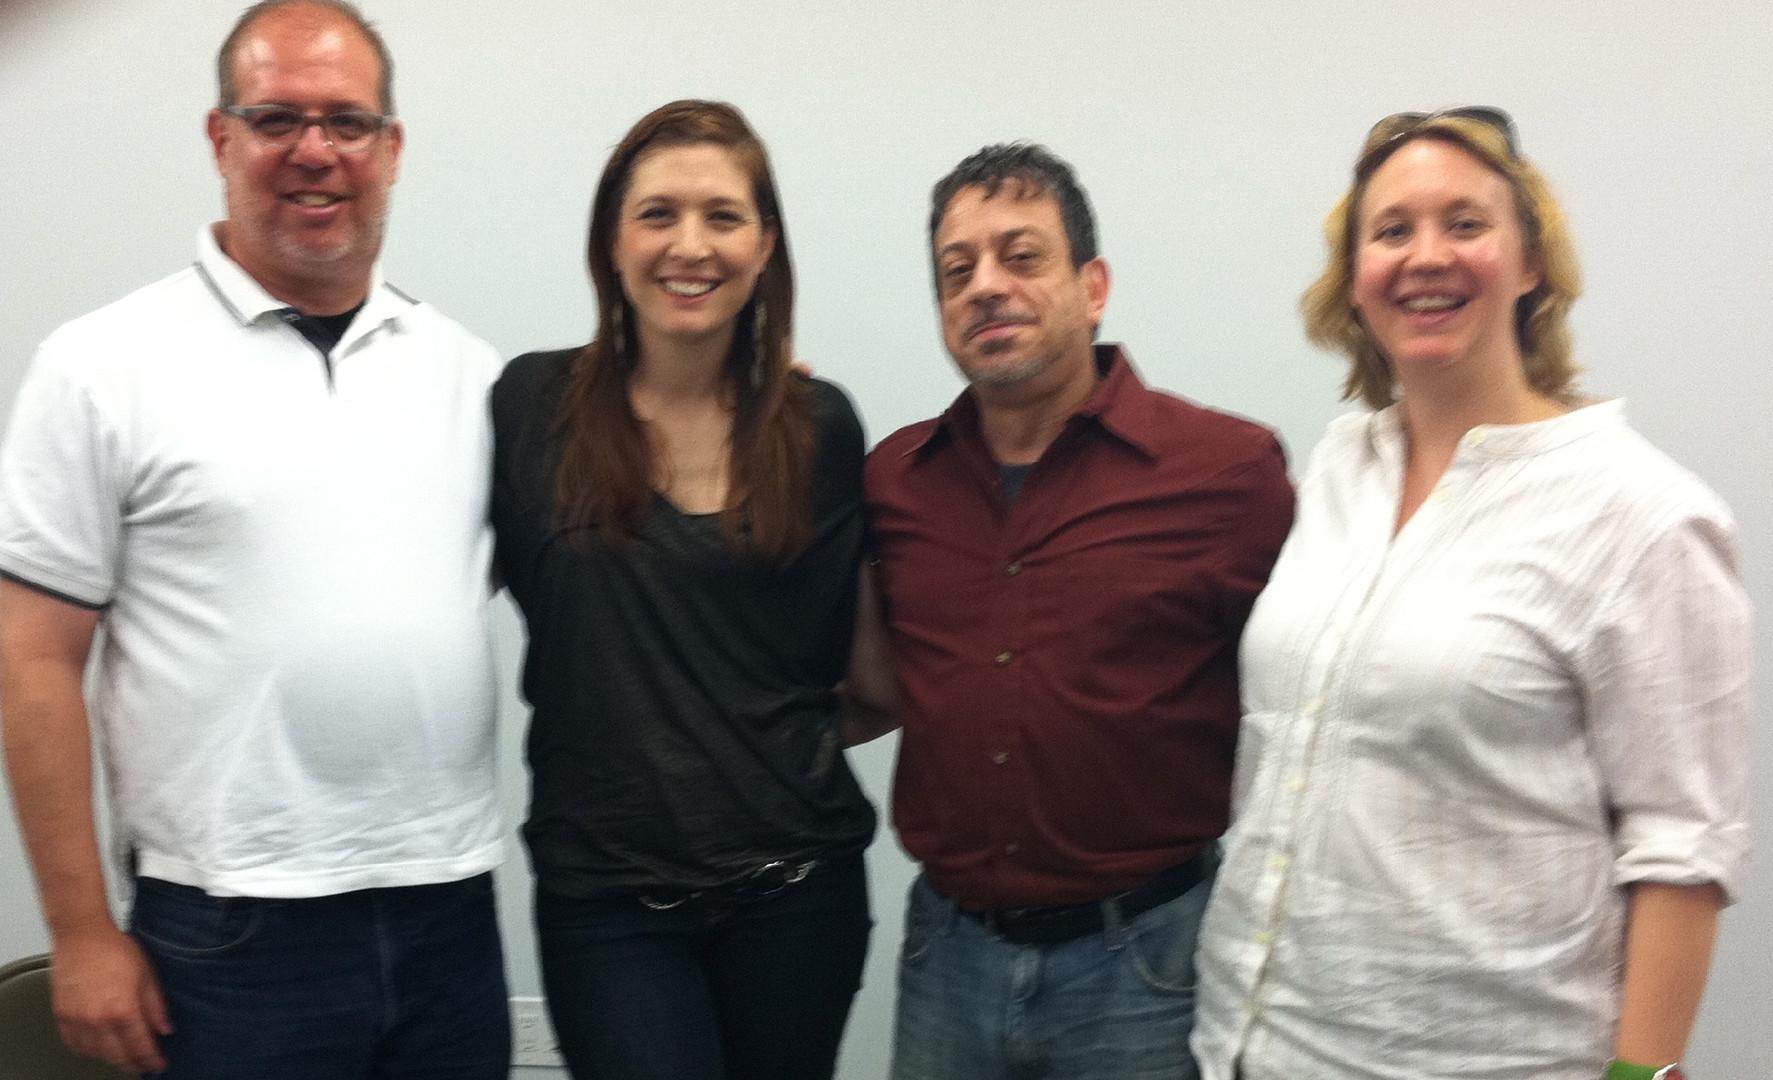 RoaN Party With a Purpose: Casting Directors: Ross Meyerson, Rachel McKinney, Vic DiMonda, Noel Neeb